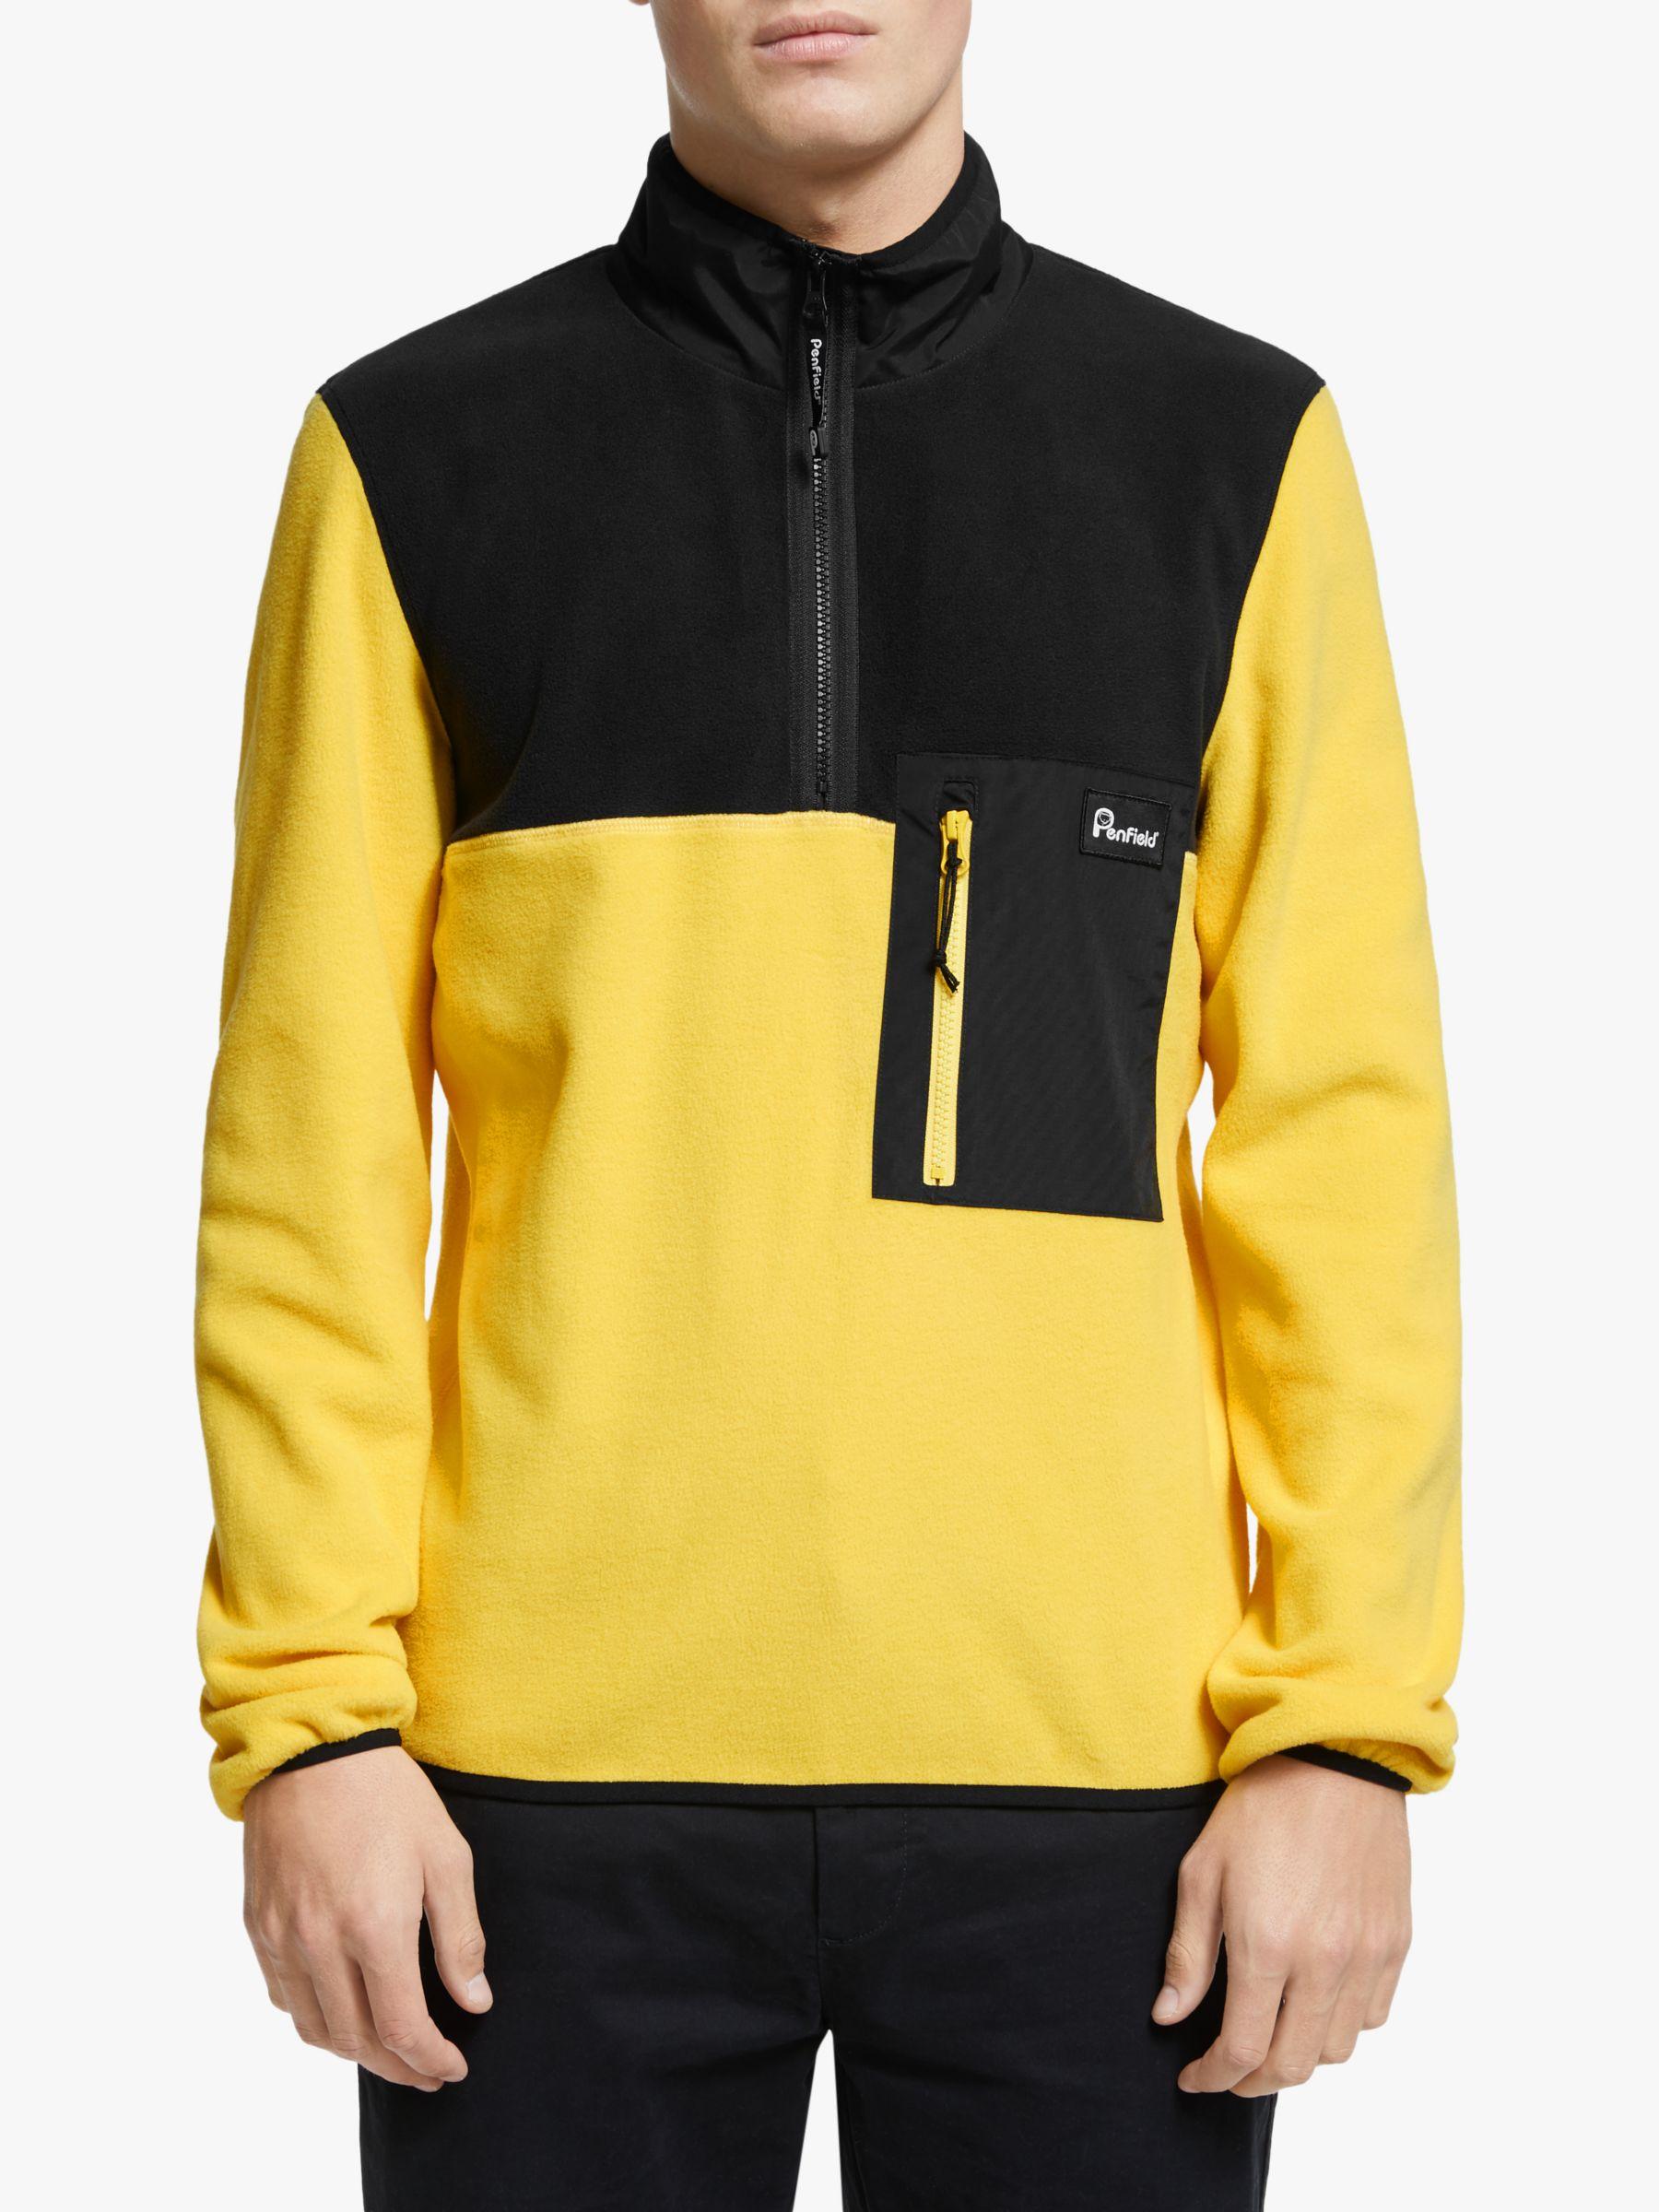 Penfield Penfield Hynes Half Zip Men's Fleece, Freesia Yellow